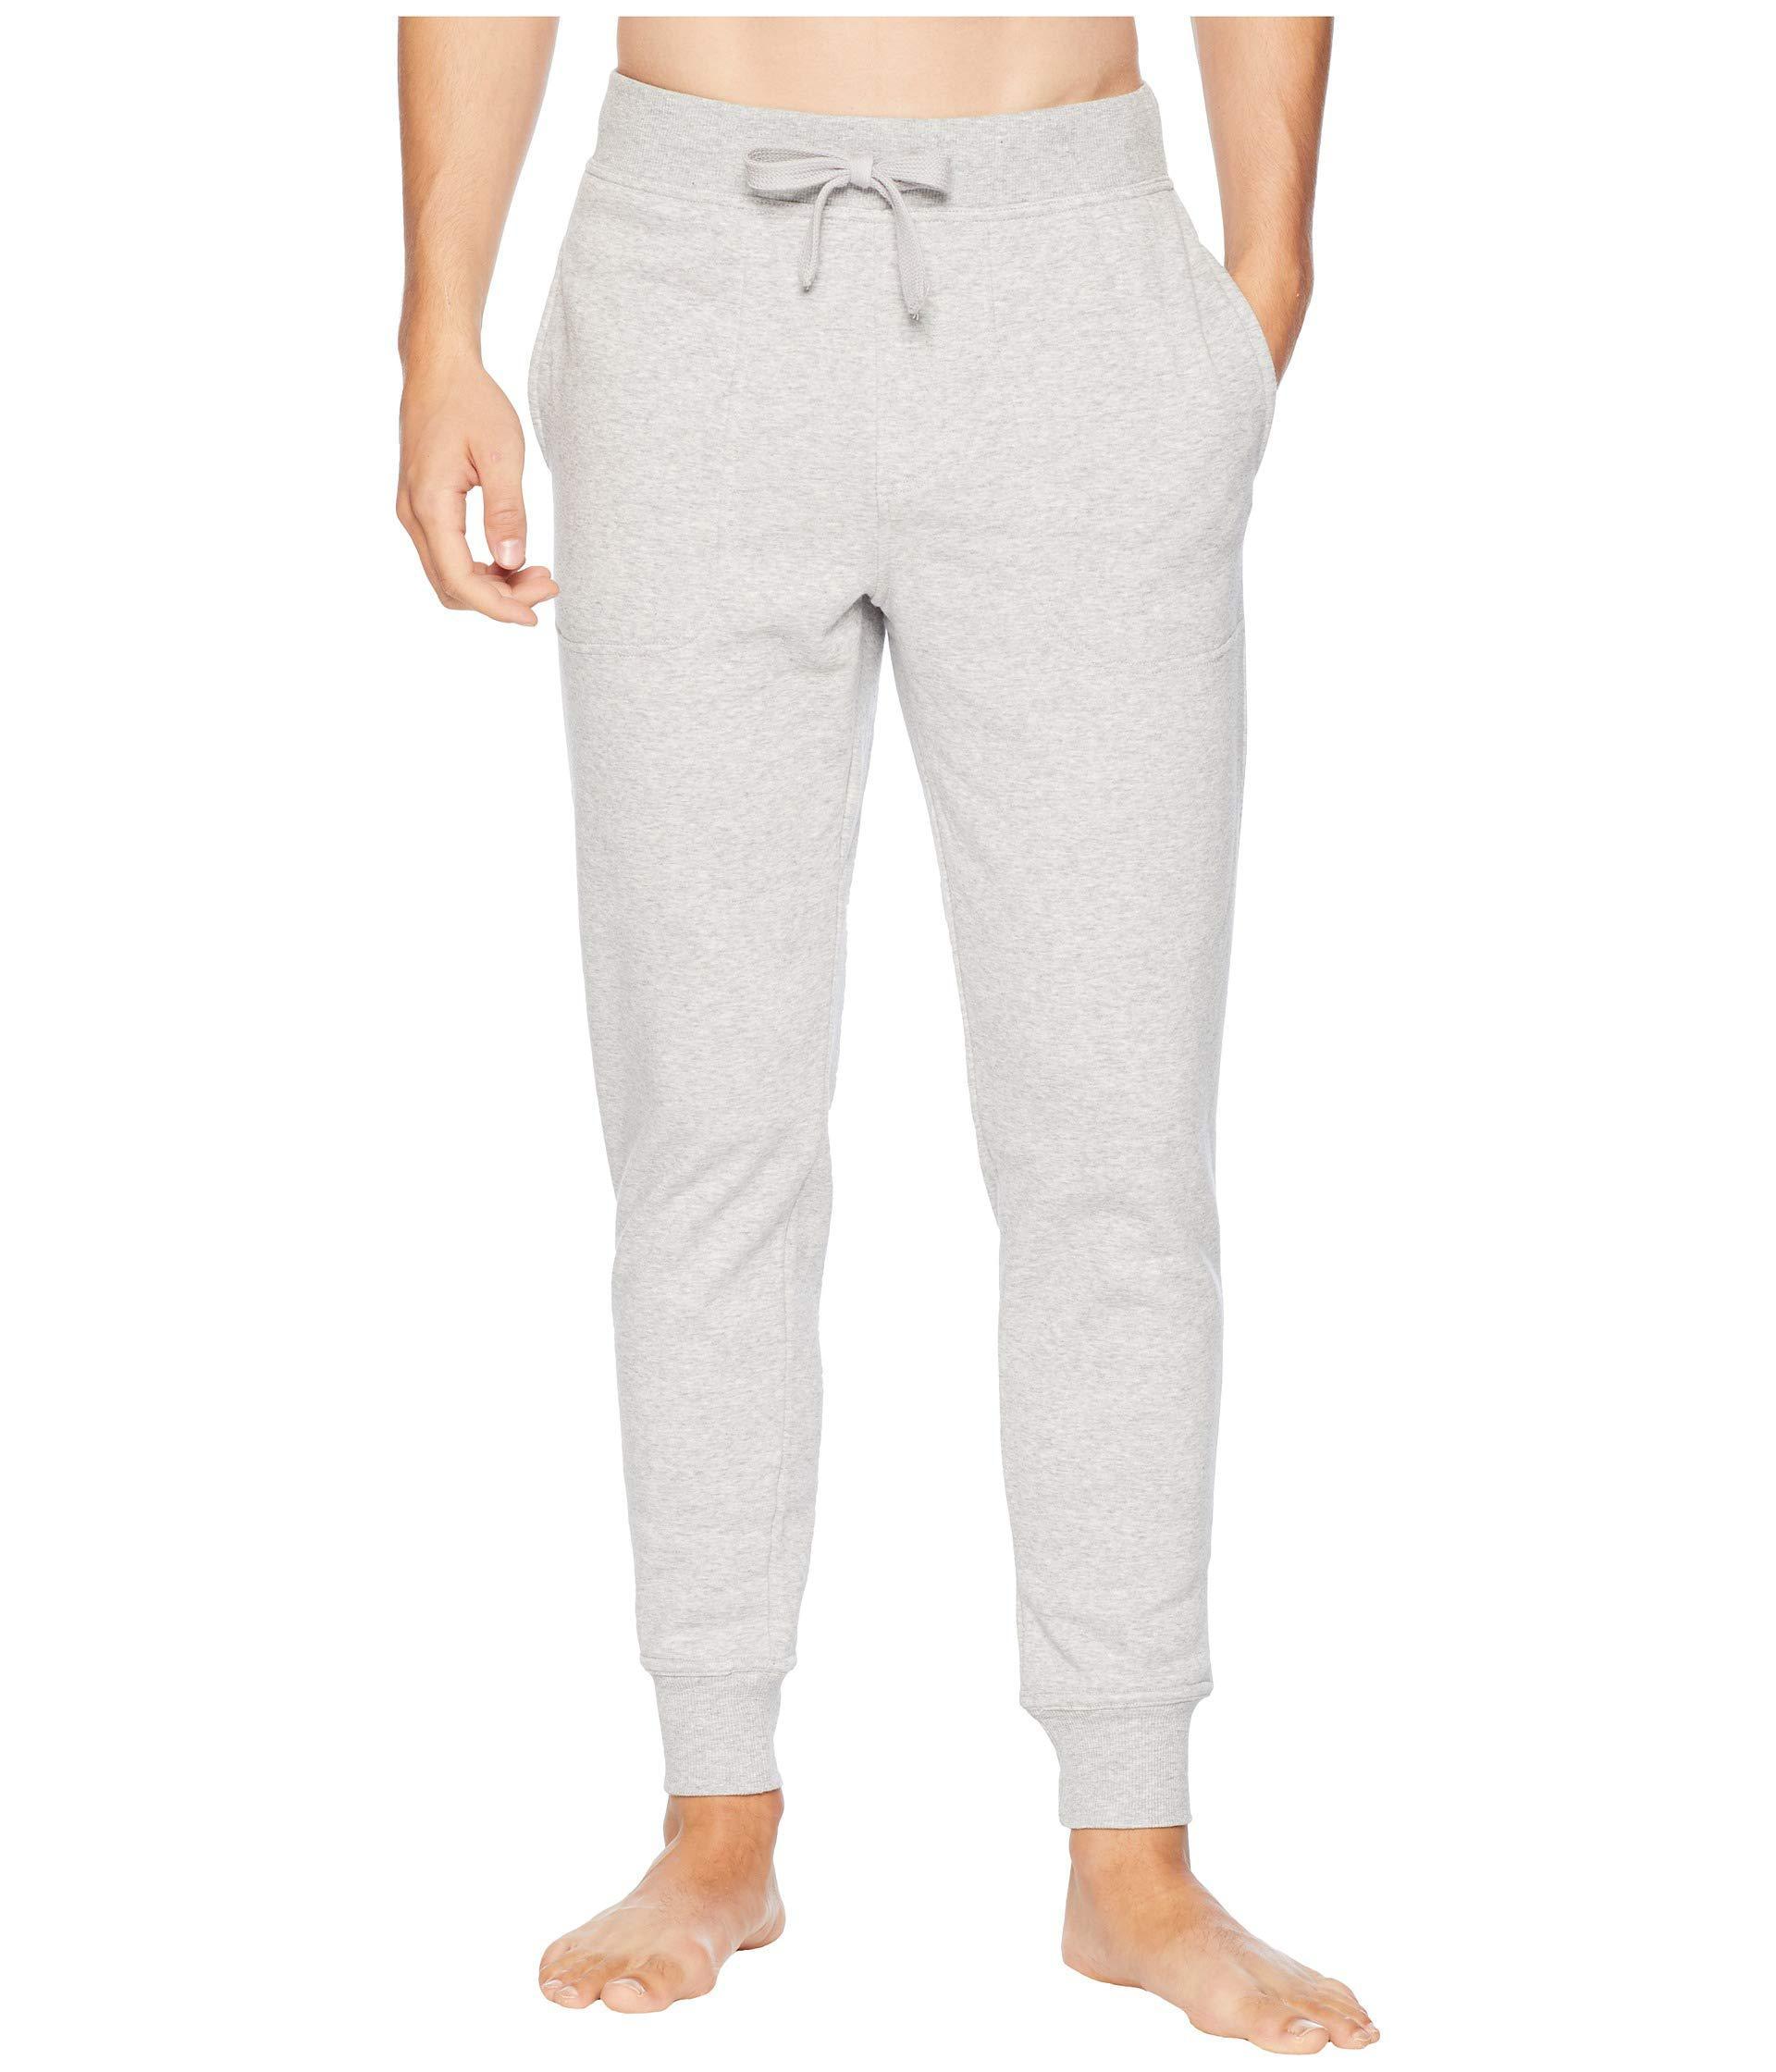 Lyst - Ugg Jakob Lounge Bottom (navy) Men s Pajama in Gray for Men aefff6484